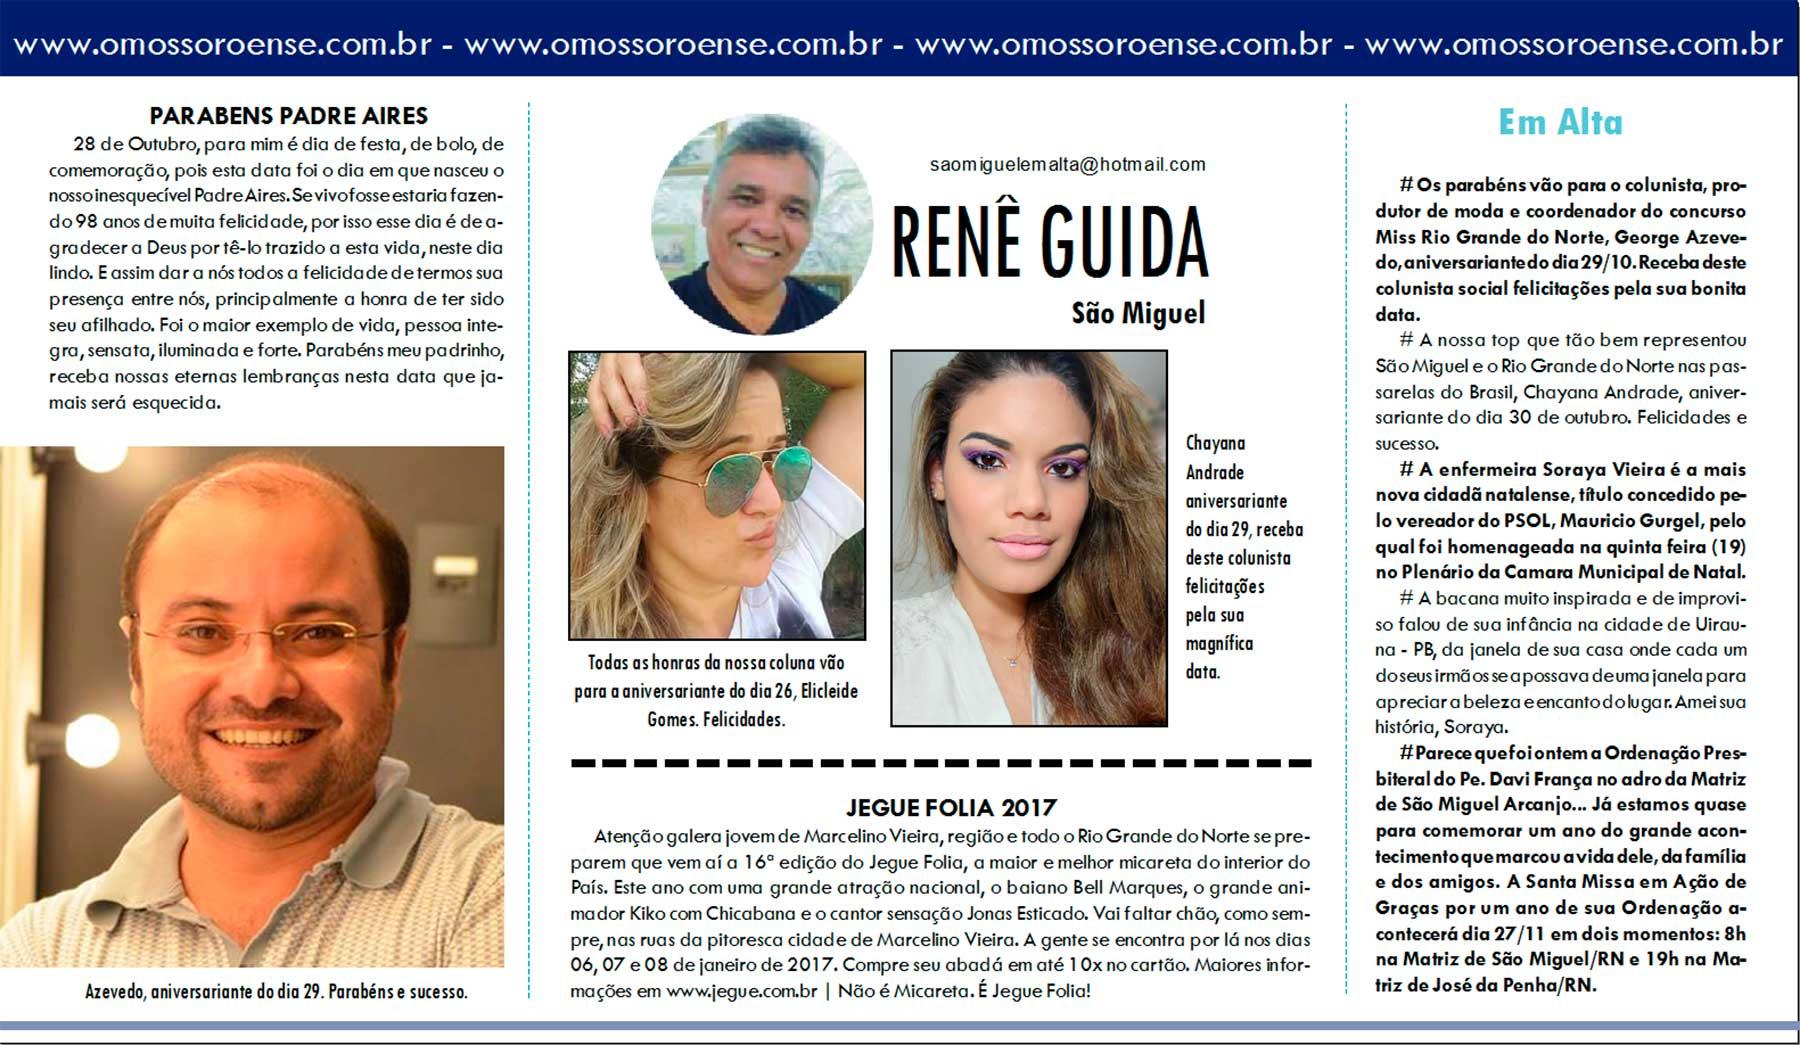 rene-guida-08-11-2016